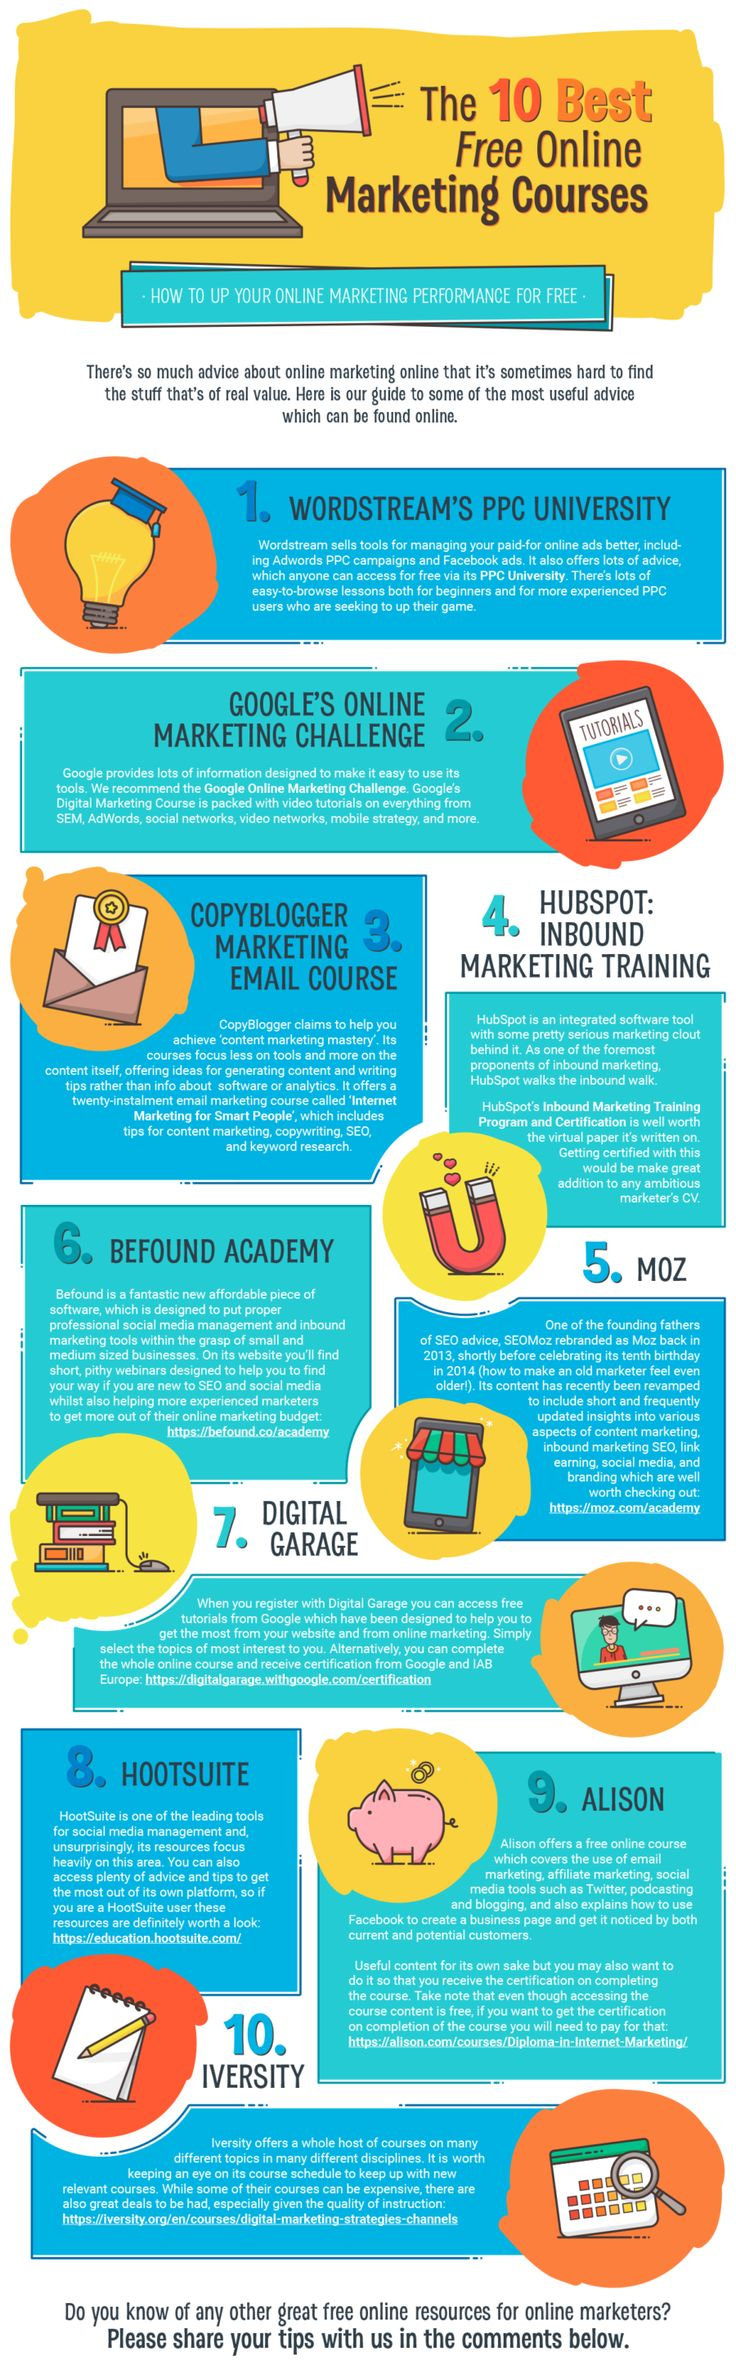 10 Best Free #Online #Marketing Courses - DAL WEB Do you fancy an infographic? There are a lot of them online, but if you want your own please visithttp://linfografico.com/en/prices/ Online girano molte infografiche, se ne vuoi realizzare una tutta tua visitahttp://www.linfografico.com/prezzi/